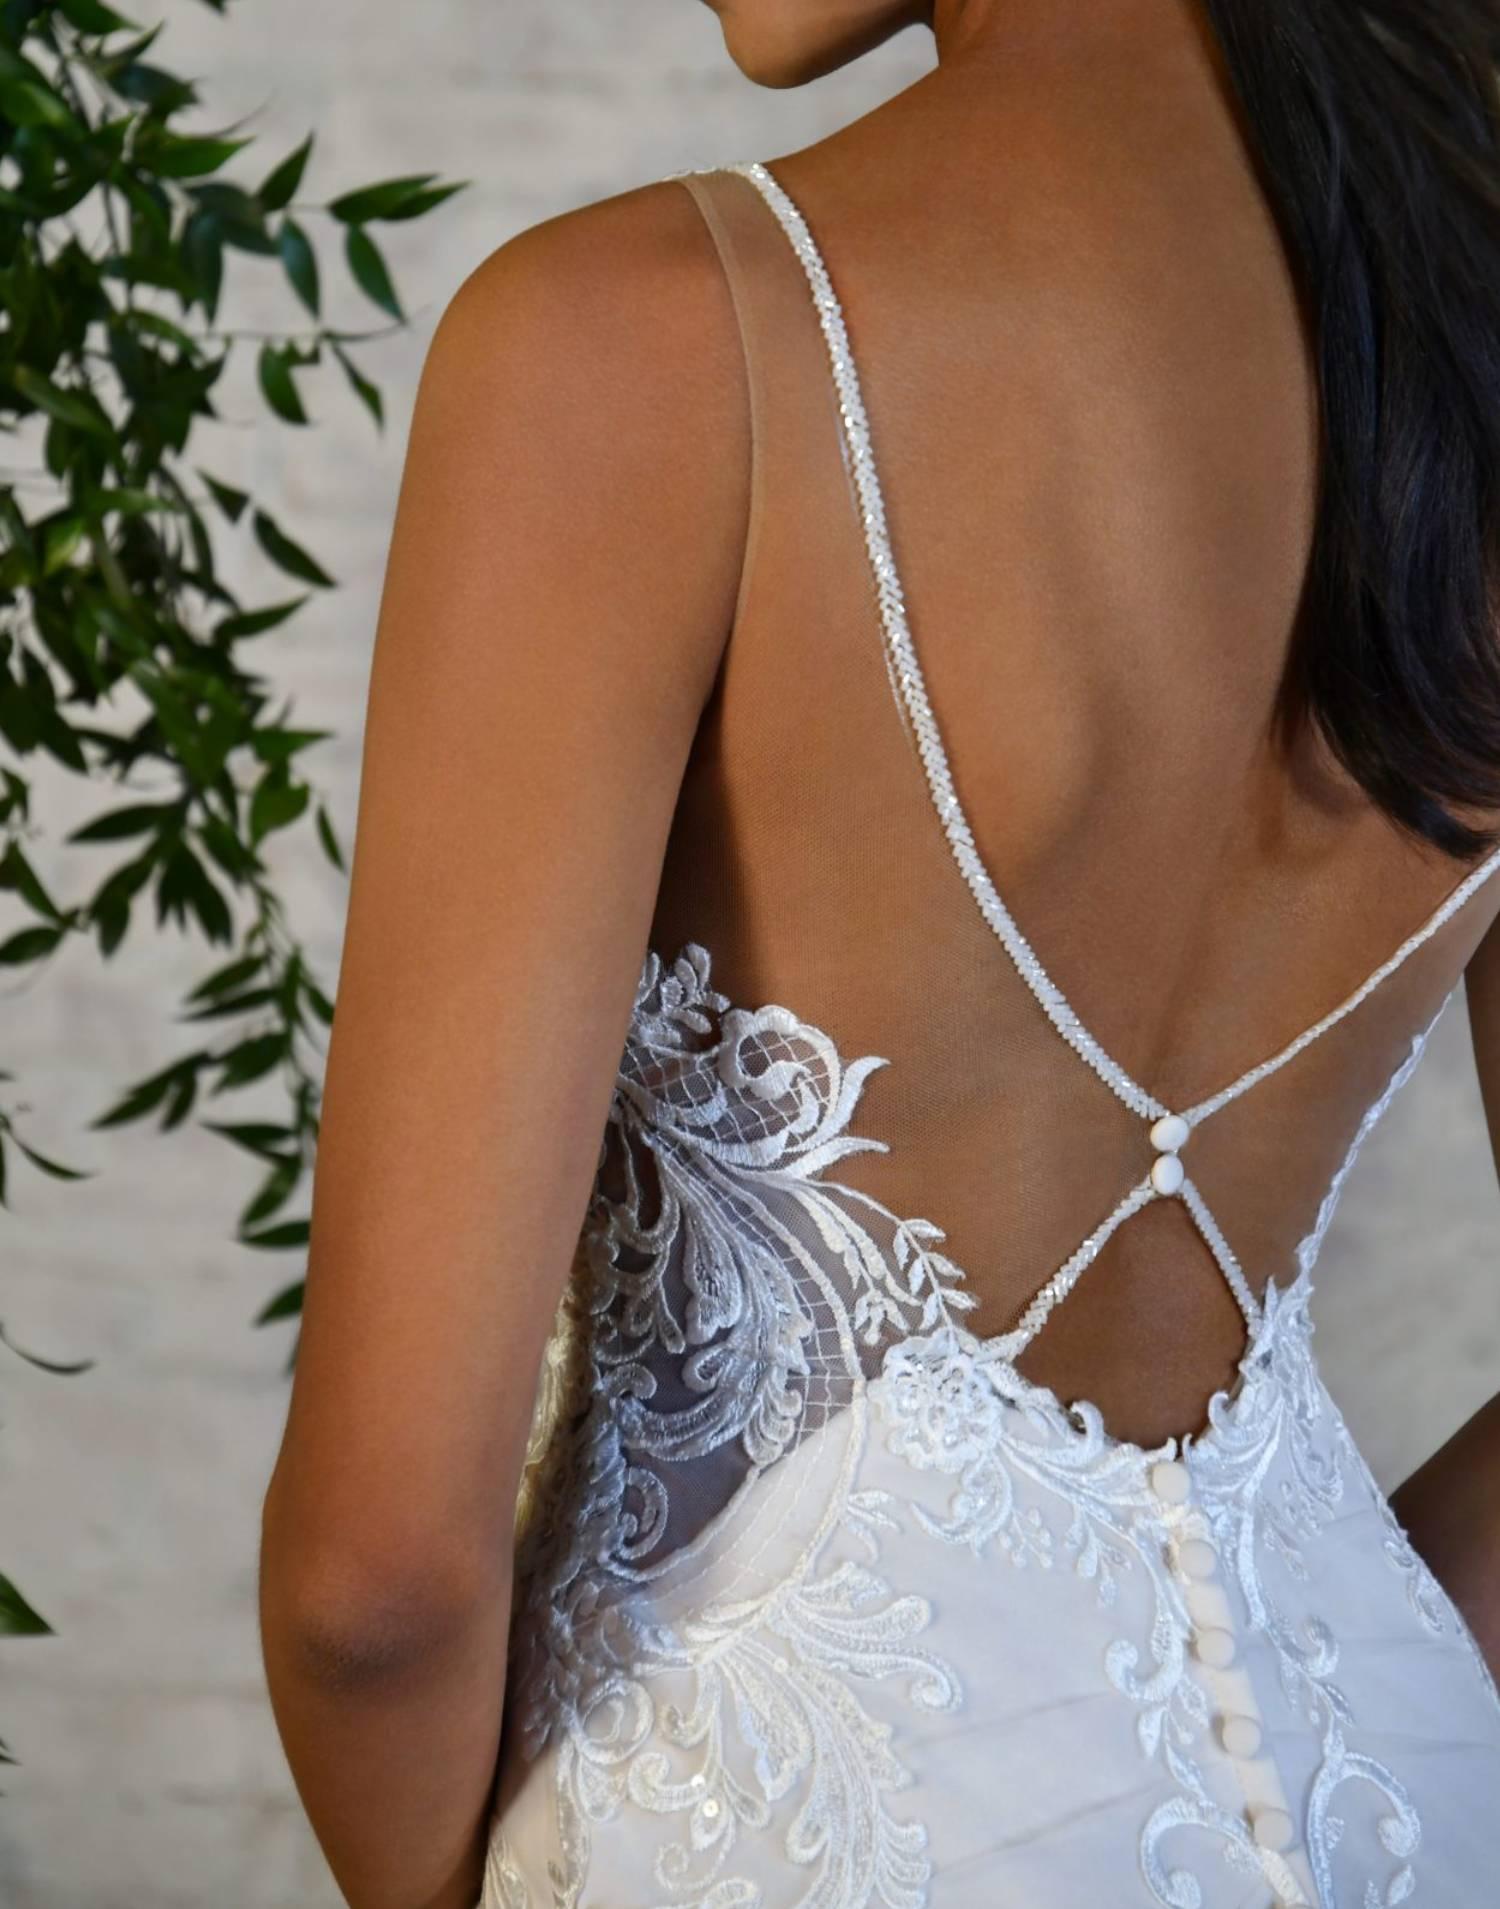 7325-wedding-dress-Stella-York-additional-front-view-min